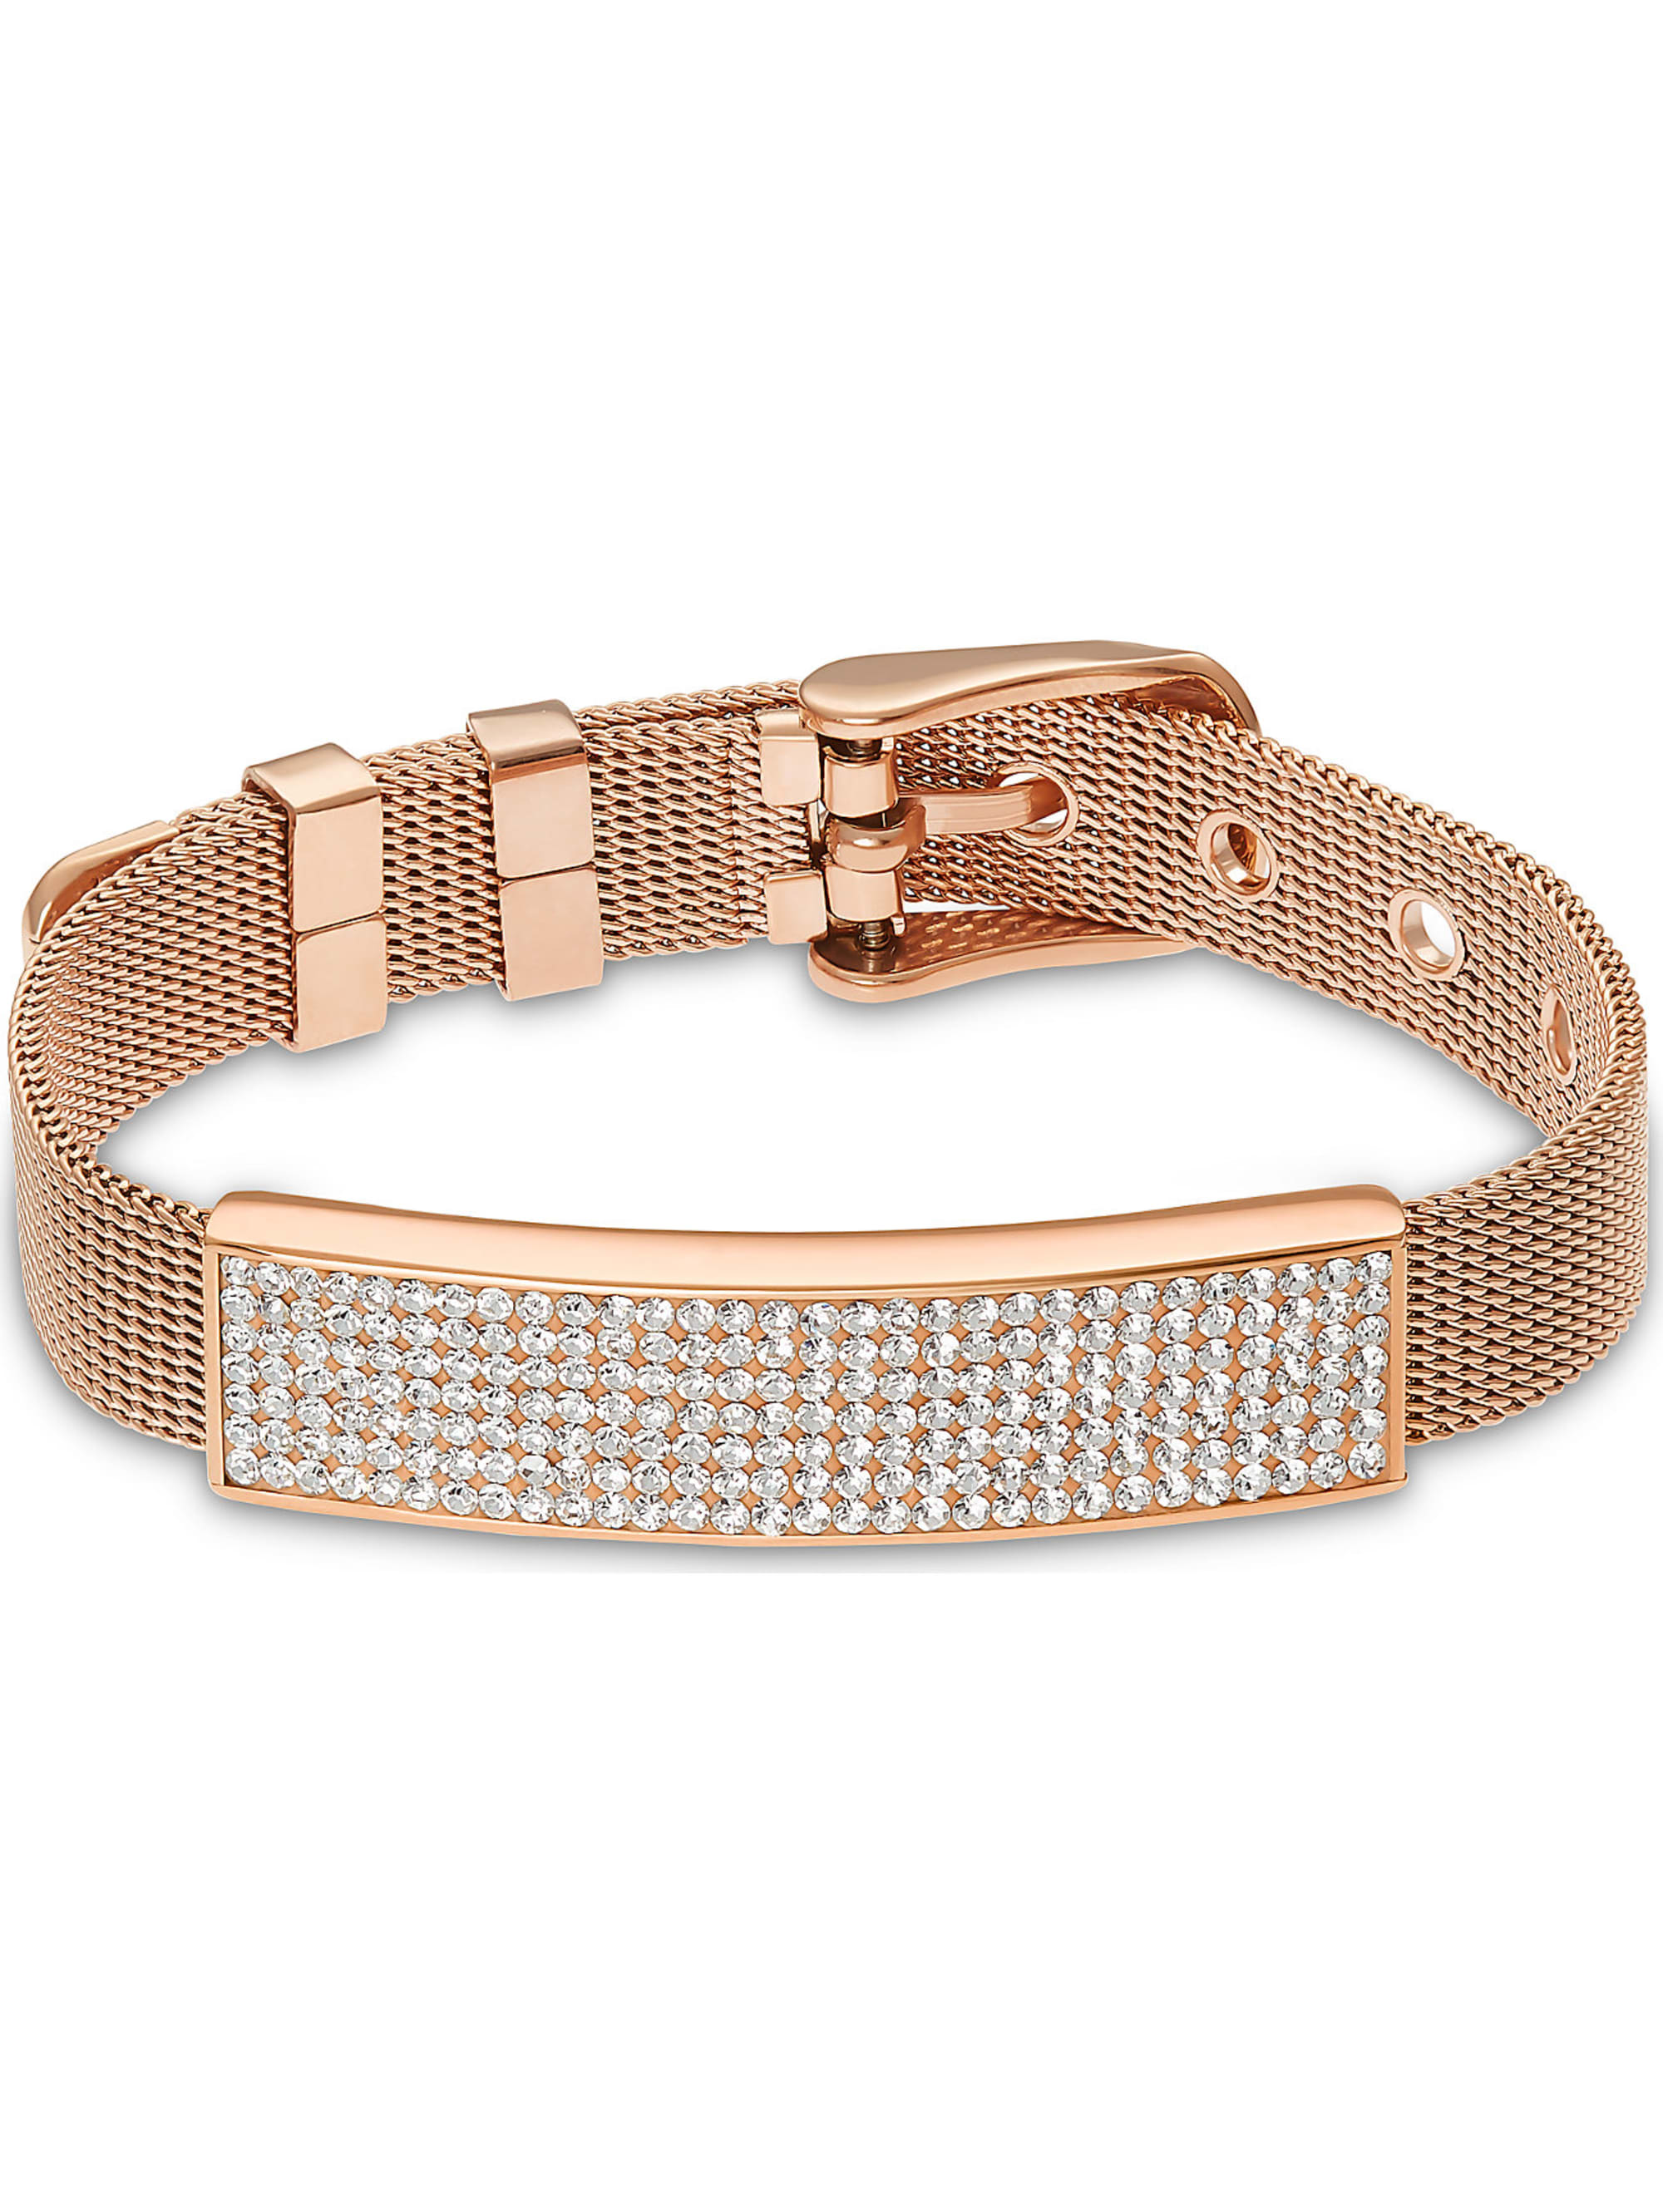 FAVS. FAVS Damen-Armband Armband aus Edelstahl Edelstahl 210 Zirkonia 1rw5m